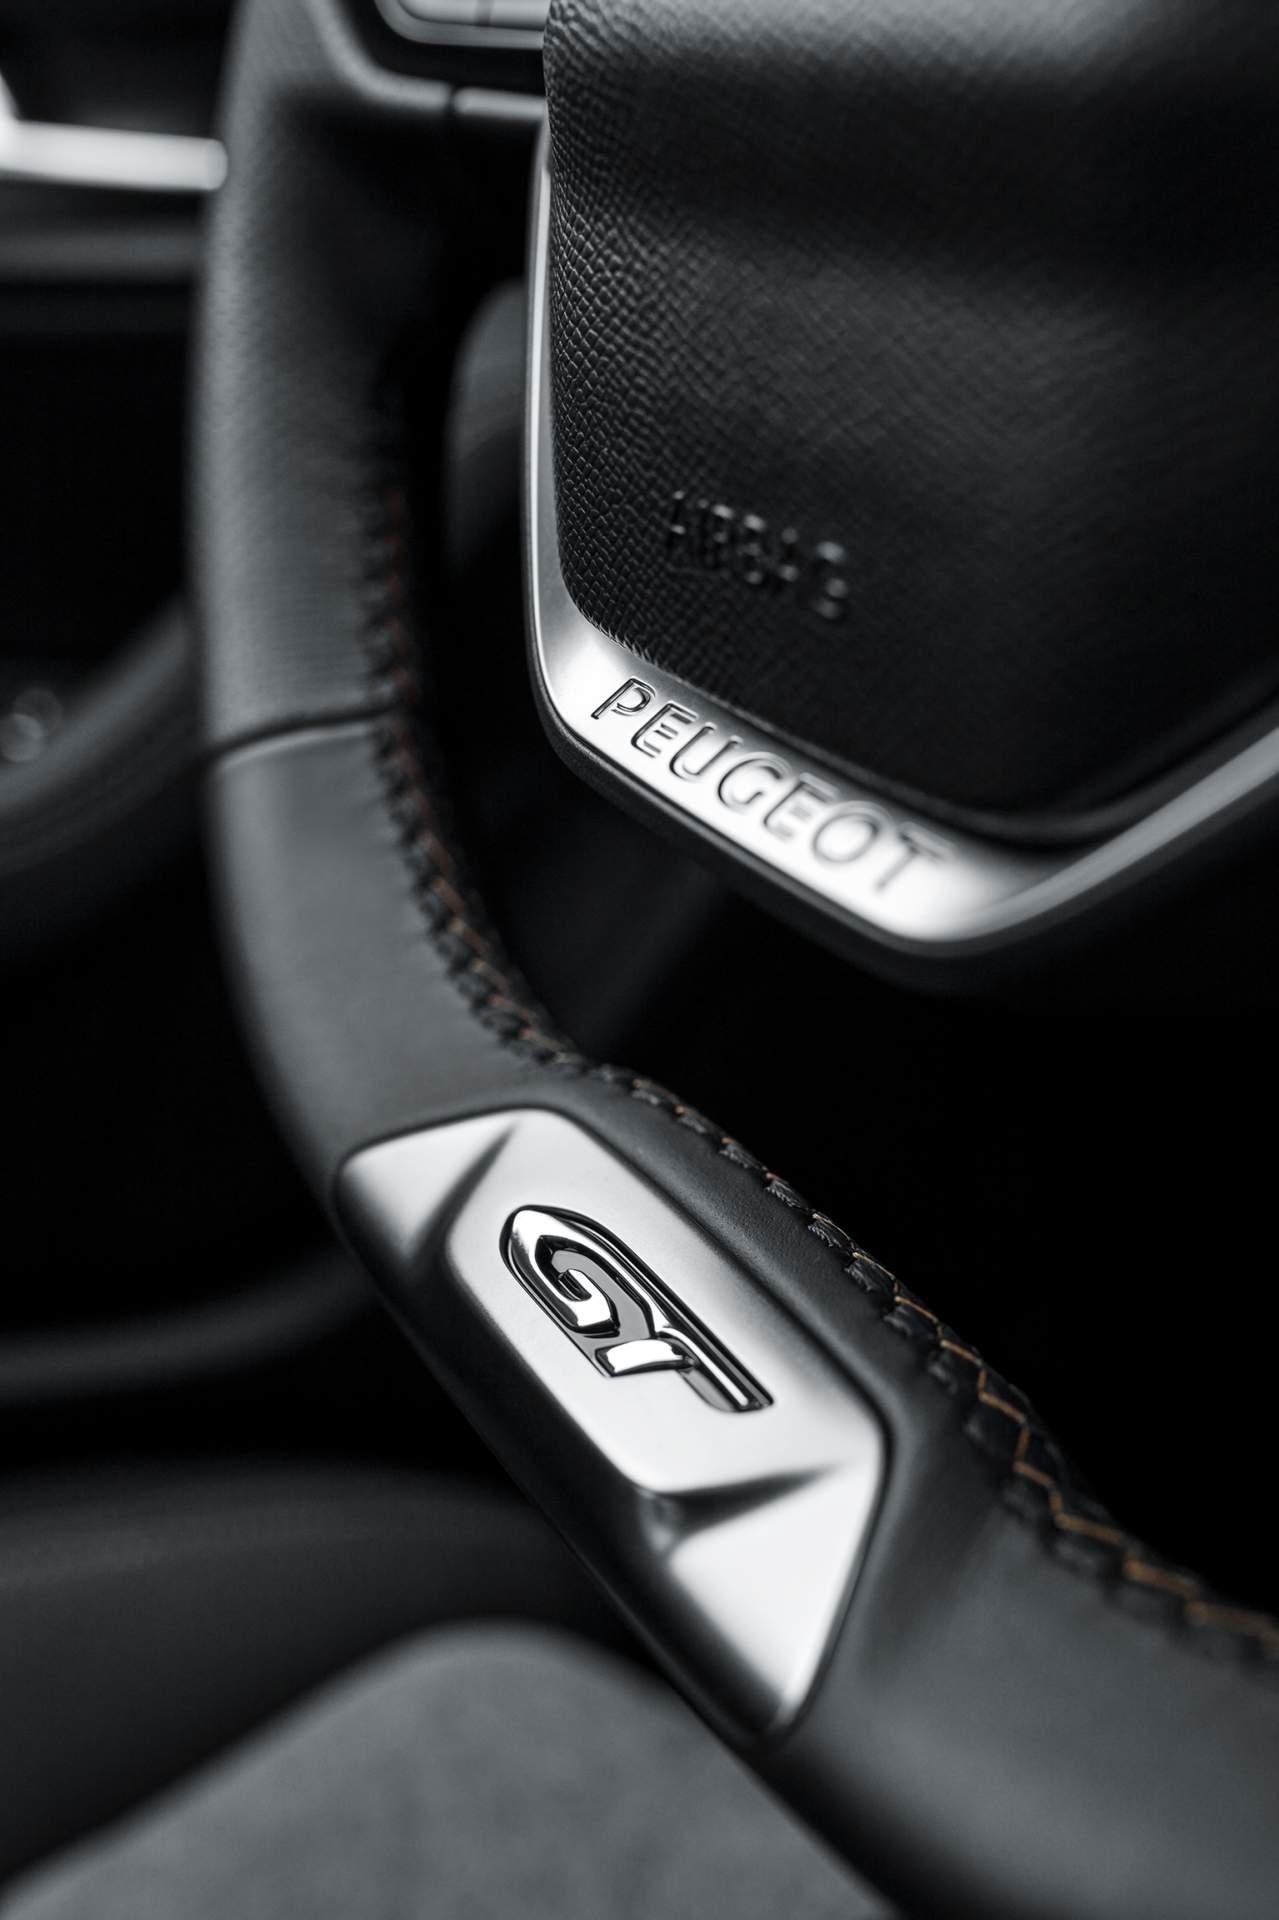 2ef0ce0a-peugeot-3008-hybrid4-1.jpeg